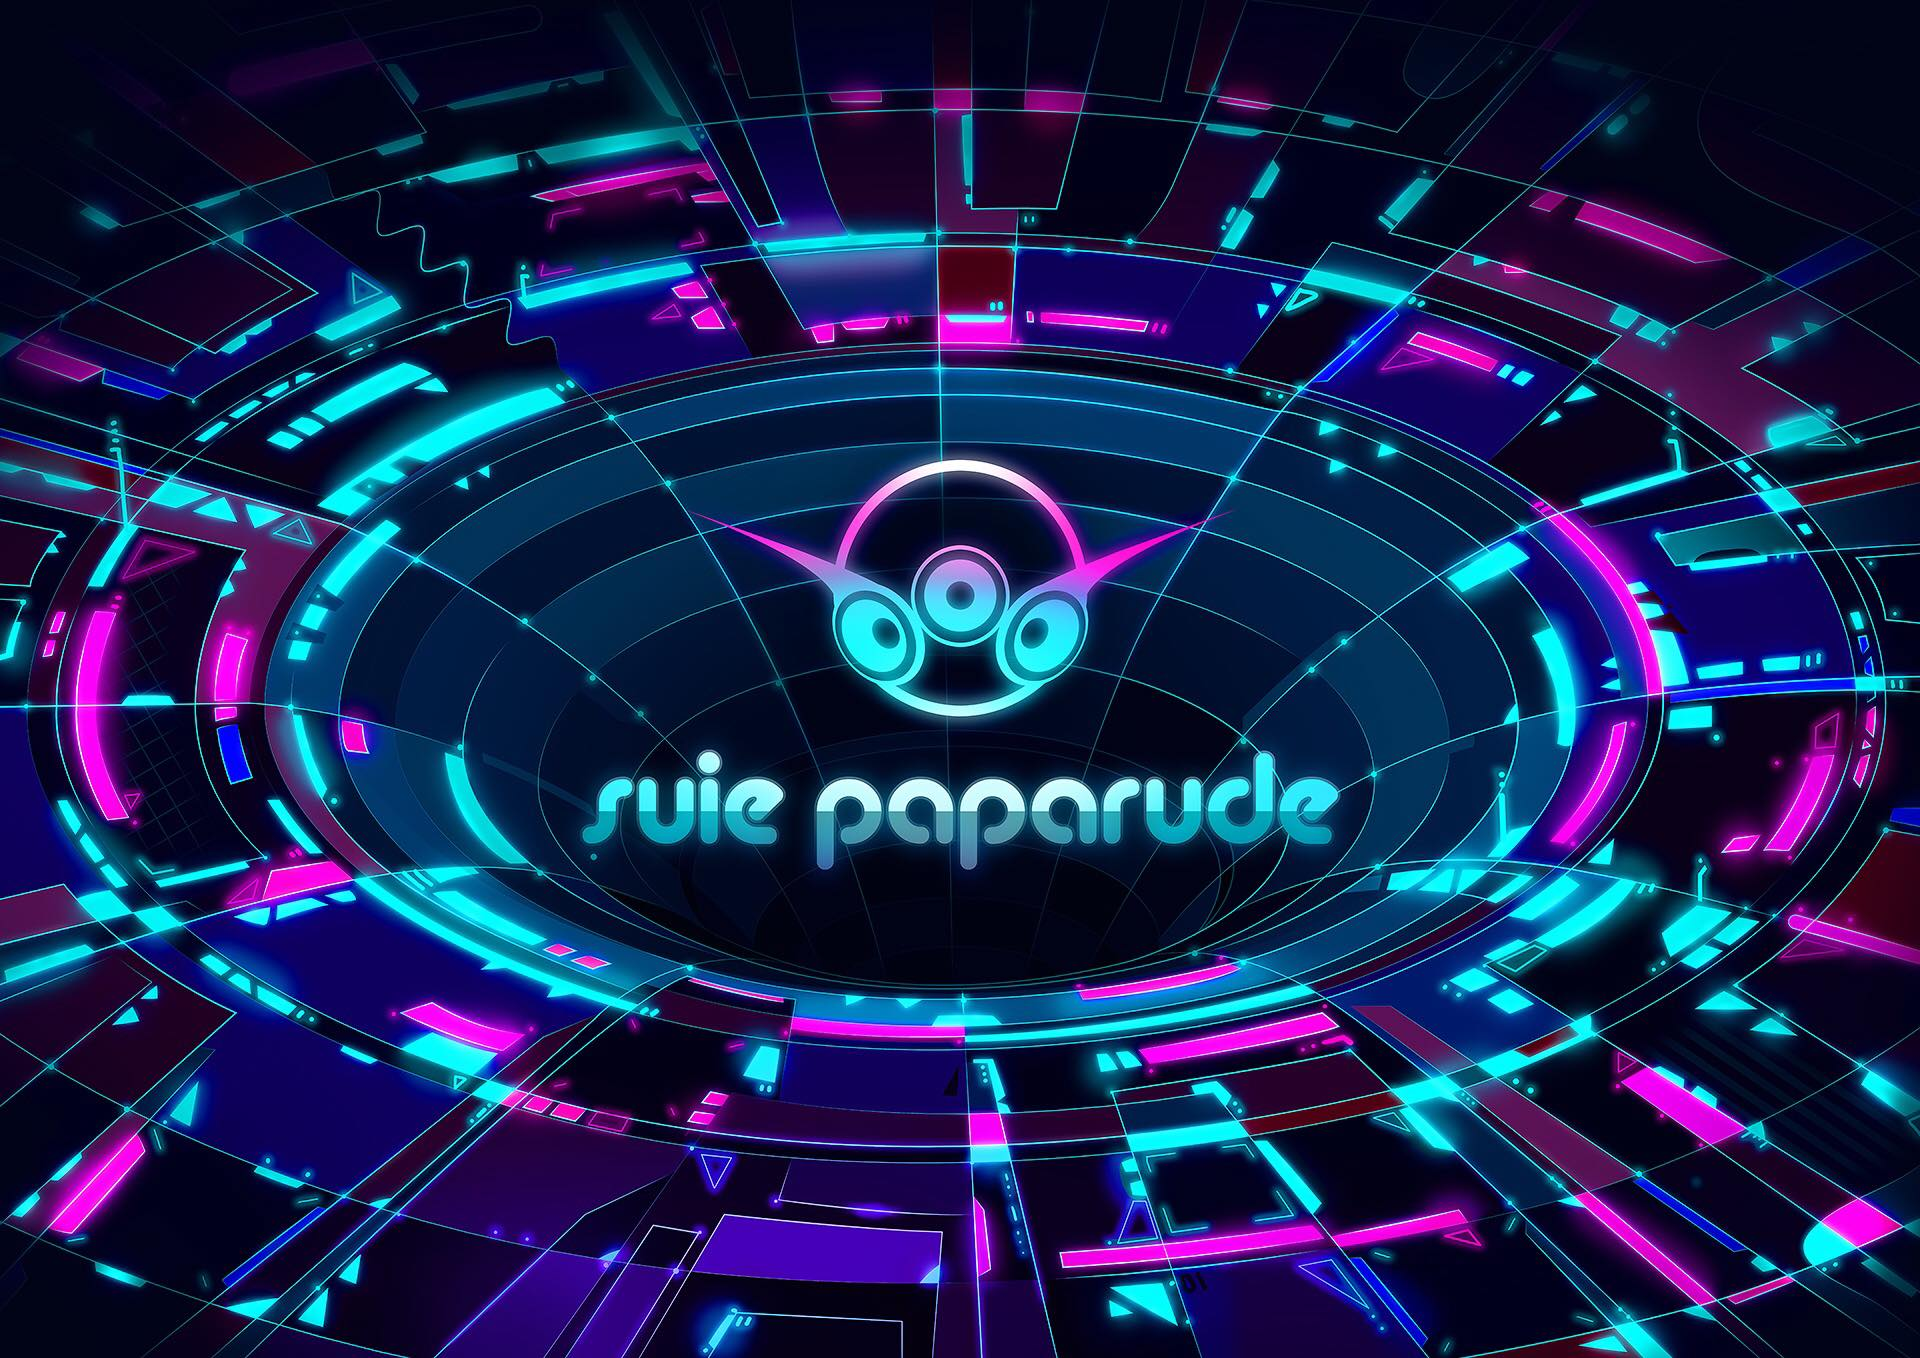 Suie Paparude Cover